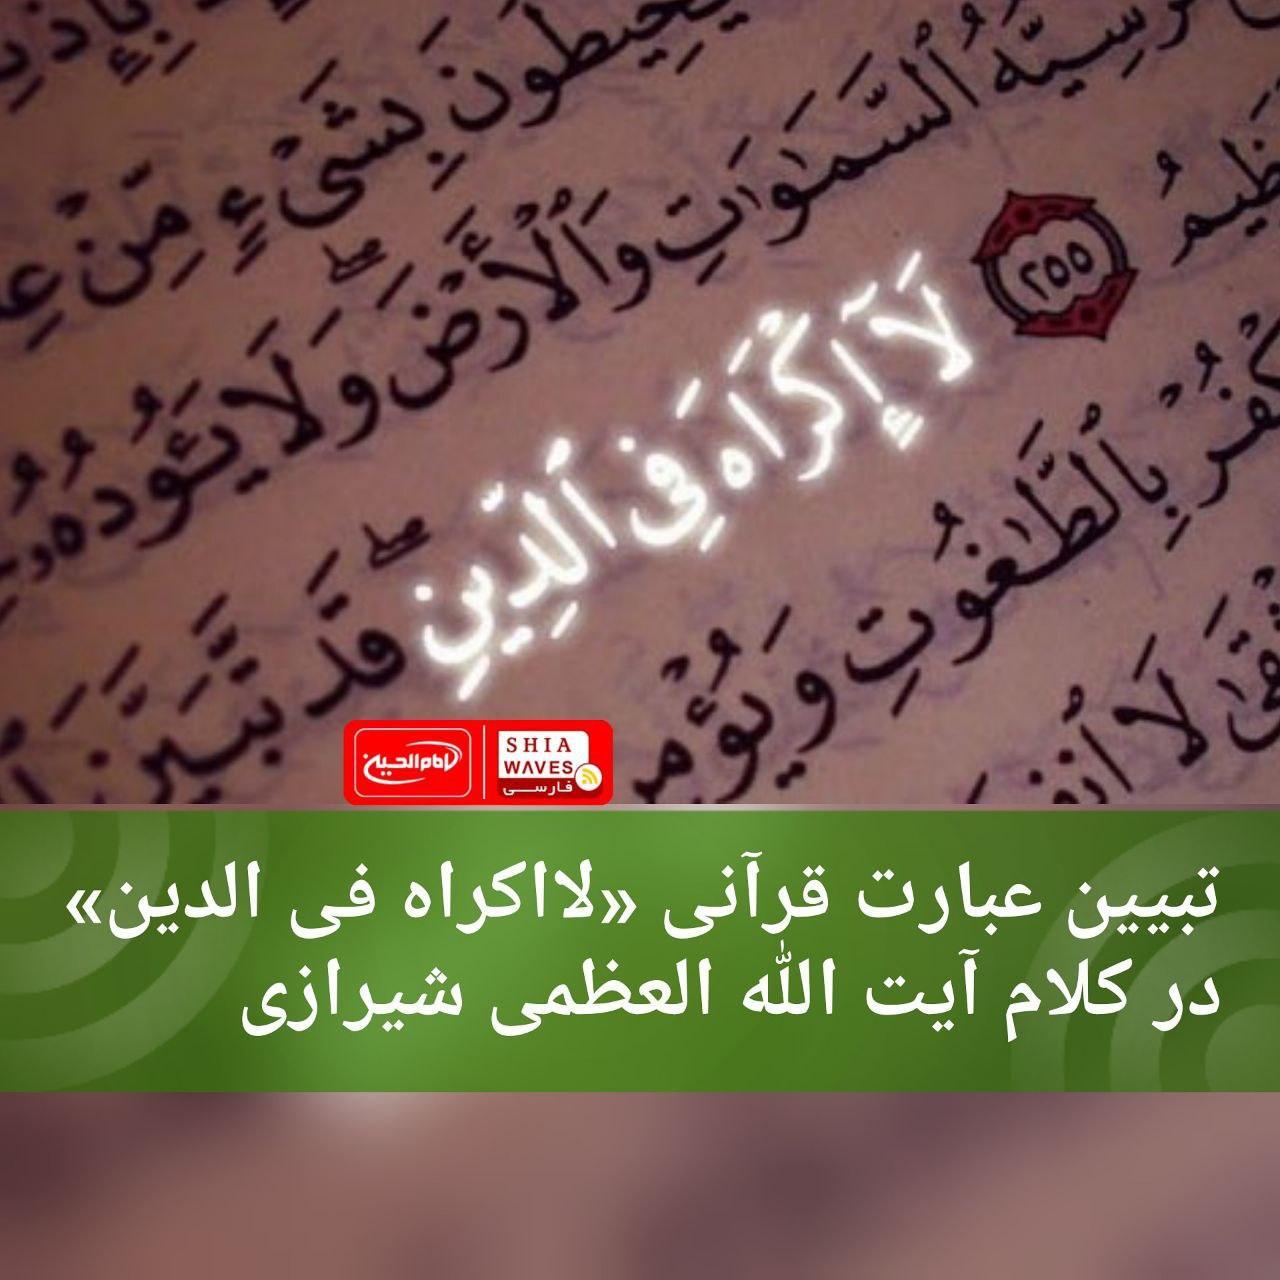 Photo of تبیین عبارت قرآنی «لااکراه فی الدین» در کلام آیت الله العظمی شیرازی